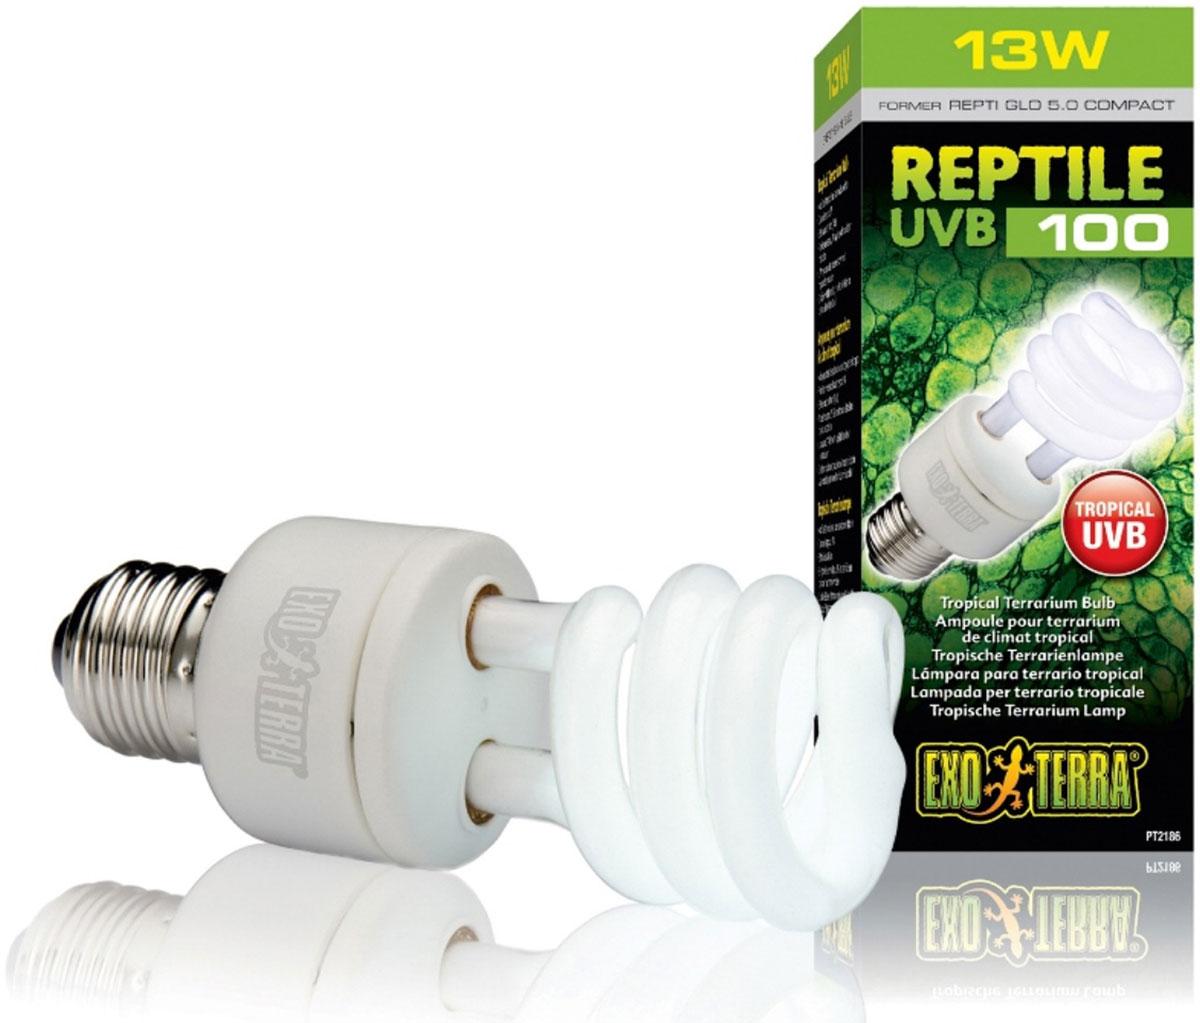 Лампа Exo Terra Repti Glo 5.0 Compact, 13 Вт new drop 2015 exo d70907